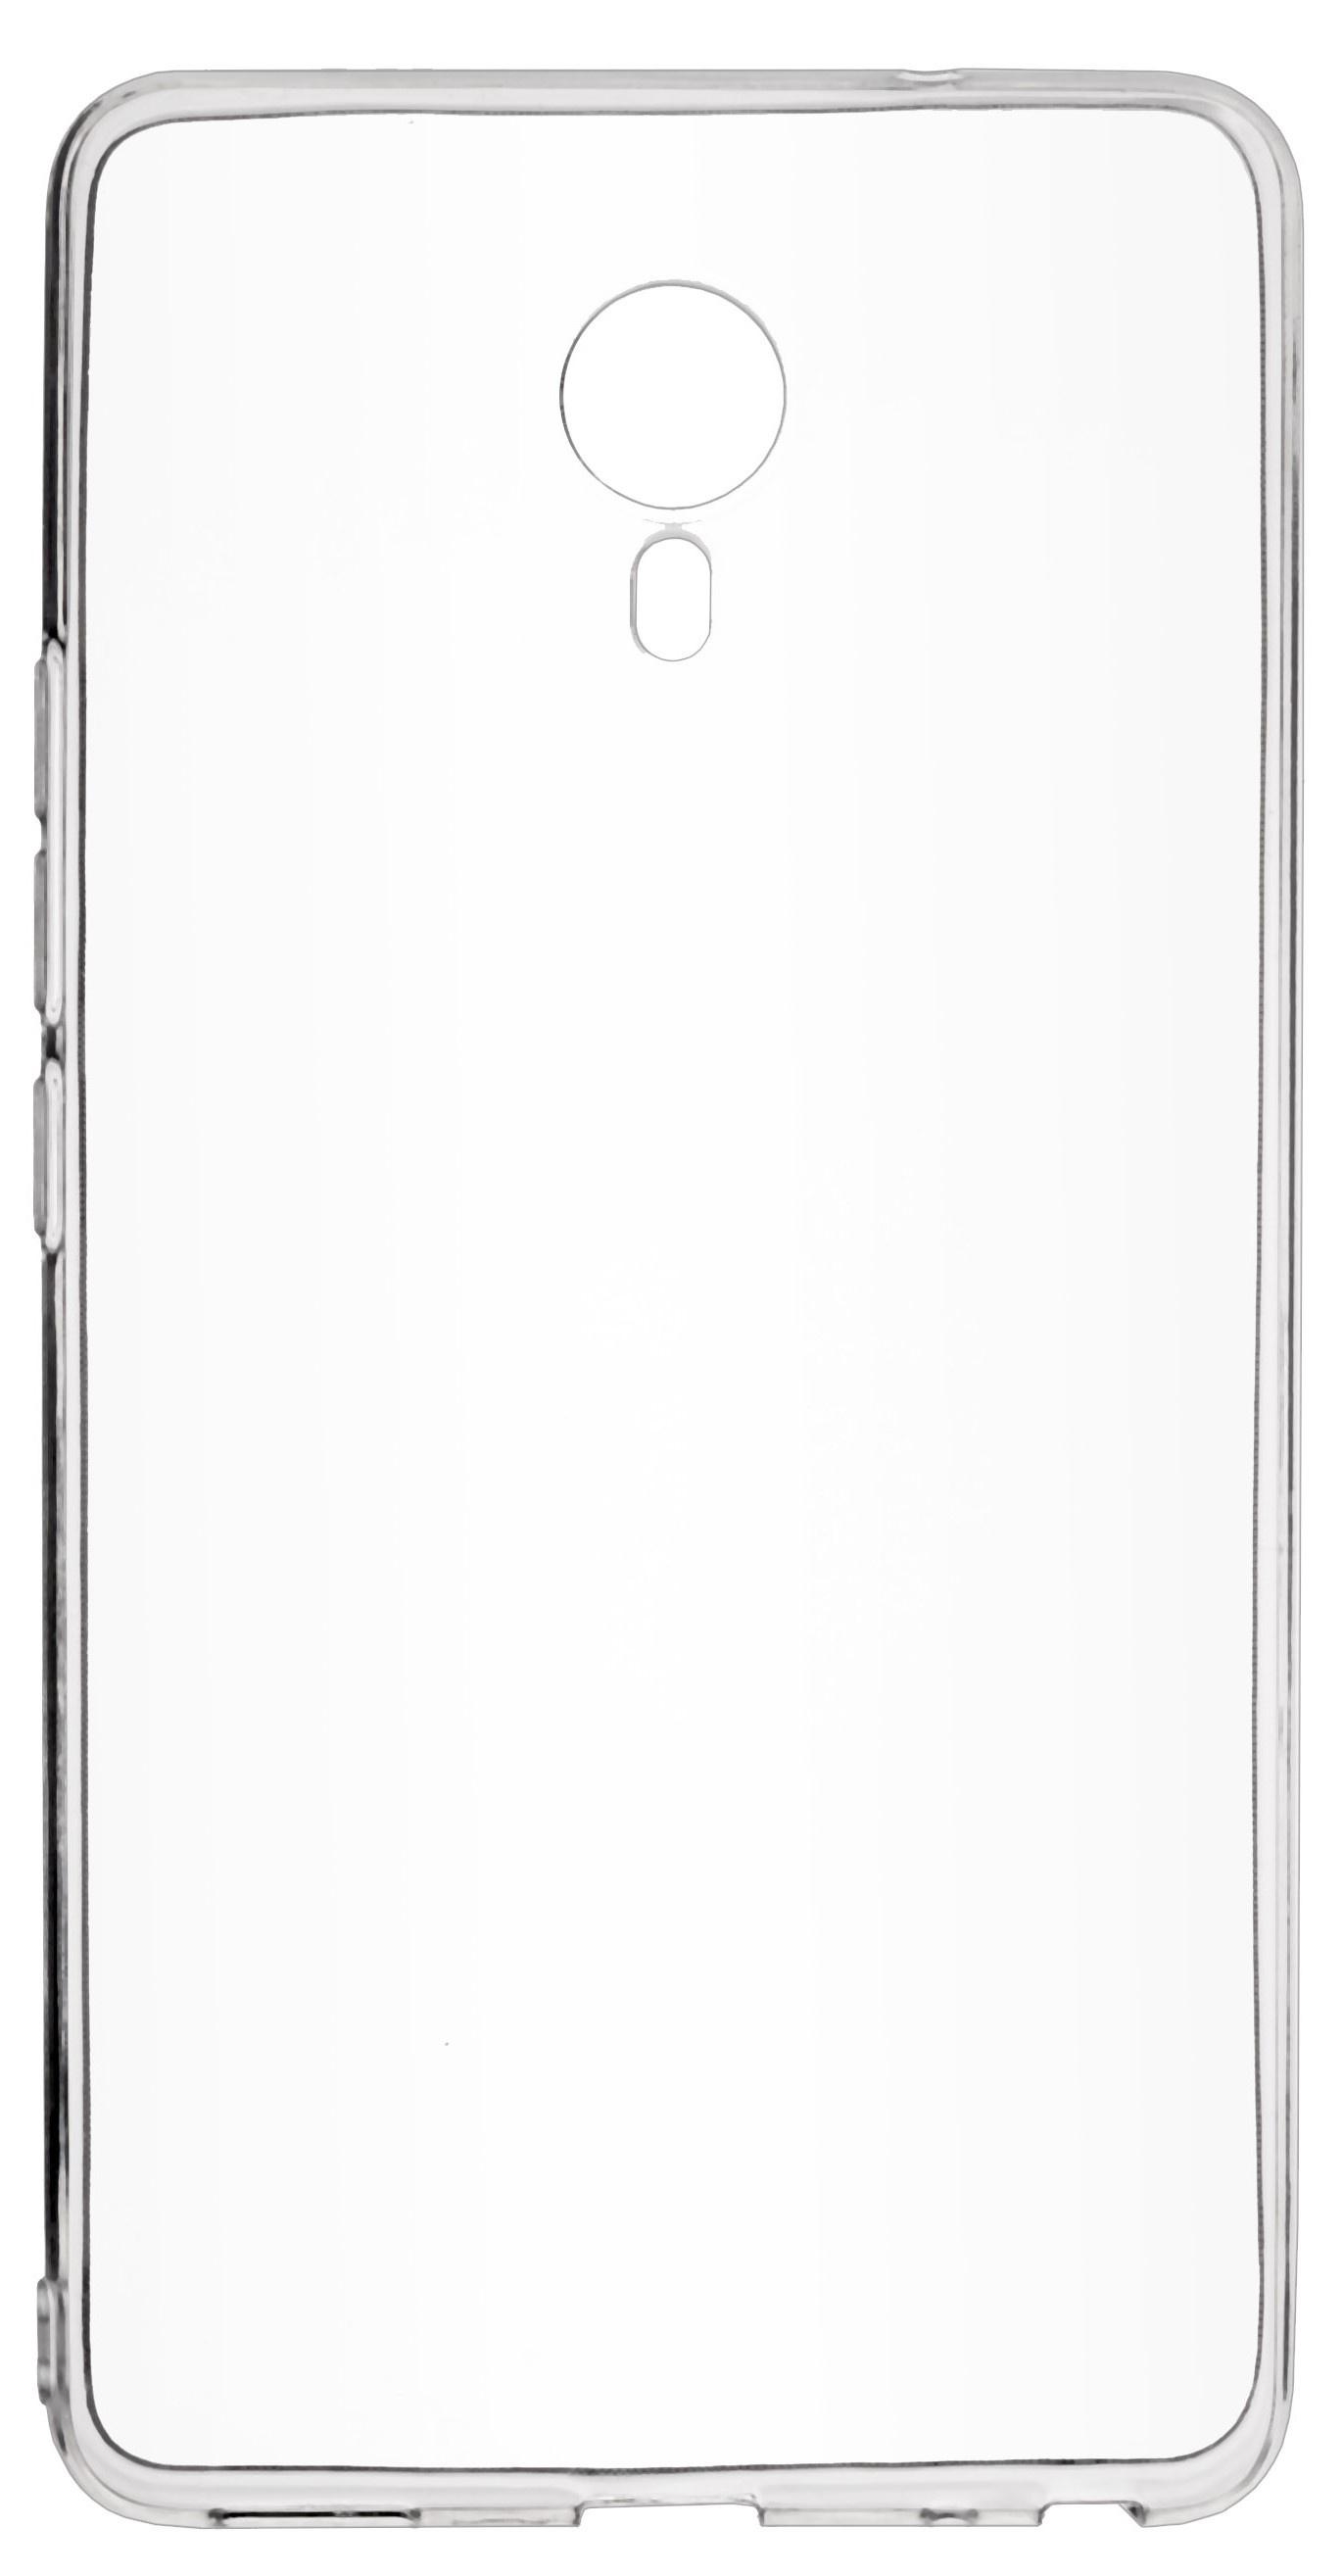 Чехол для сотового телефона skinBOX Slim Silicone, 4630042528925, прозрачный чехол для xiaomi redmi pro skinbox 4people slim silicone case прозрачный